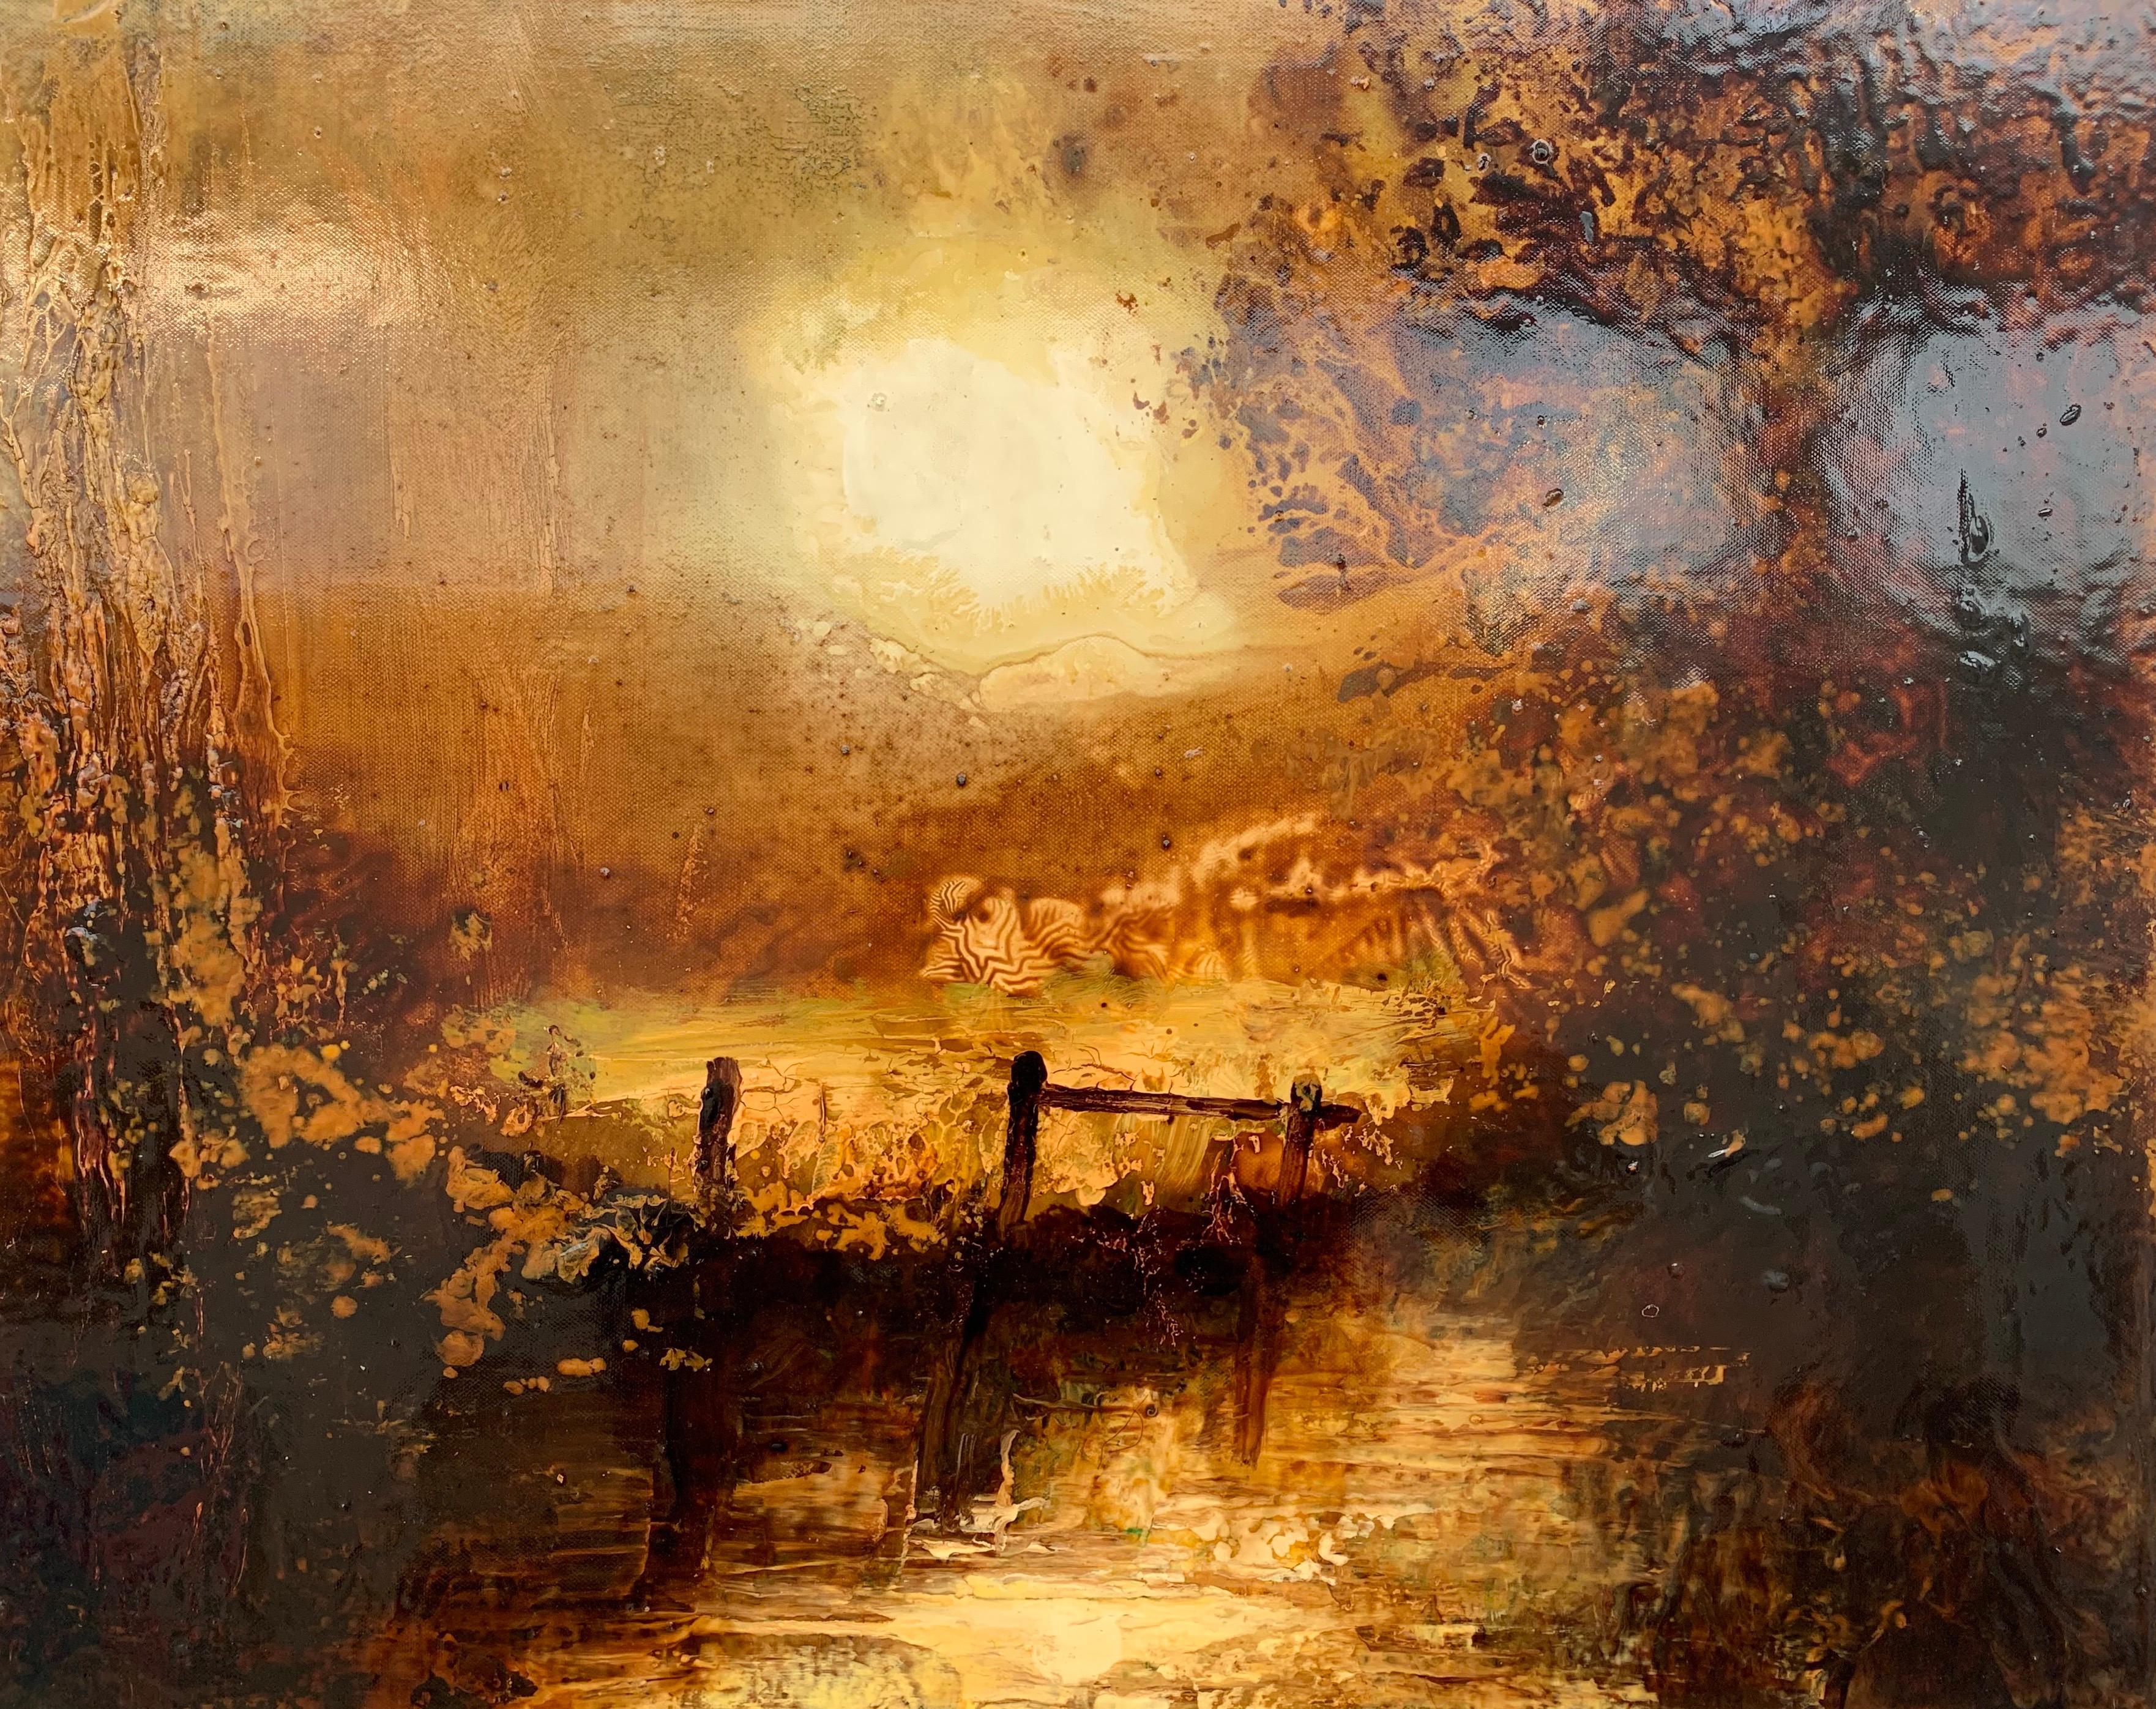 Impressionistic English River Autumn Winter Landscape Original Oil Painting